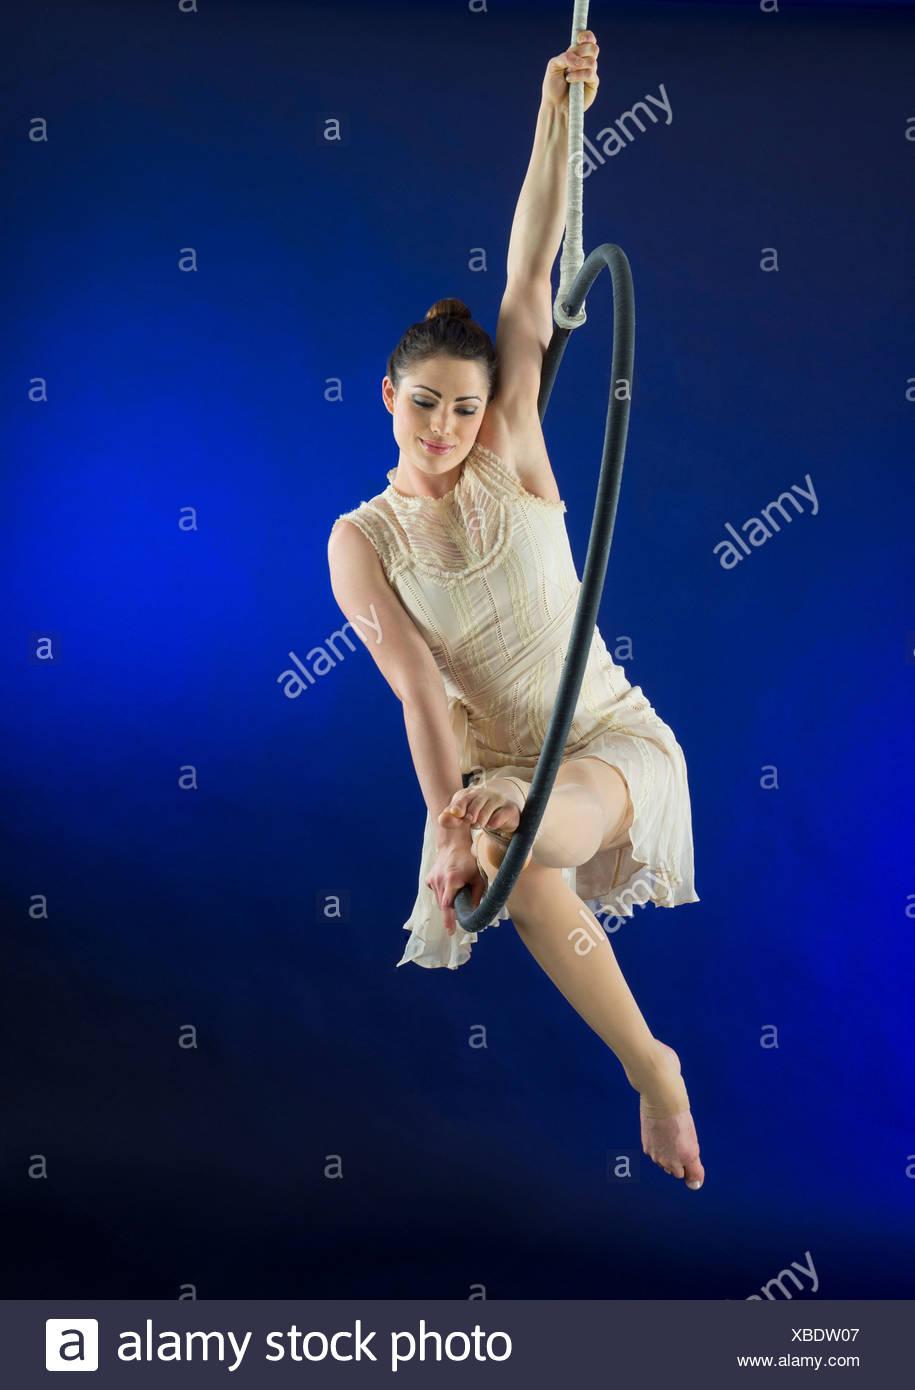 Aerialist poised on hoop against blue background Stock Photo